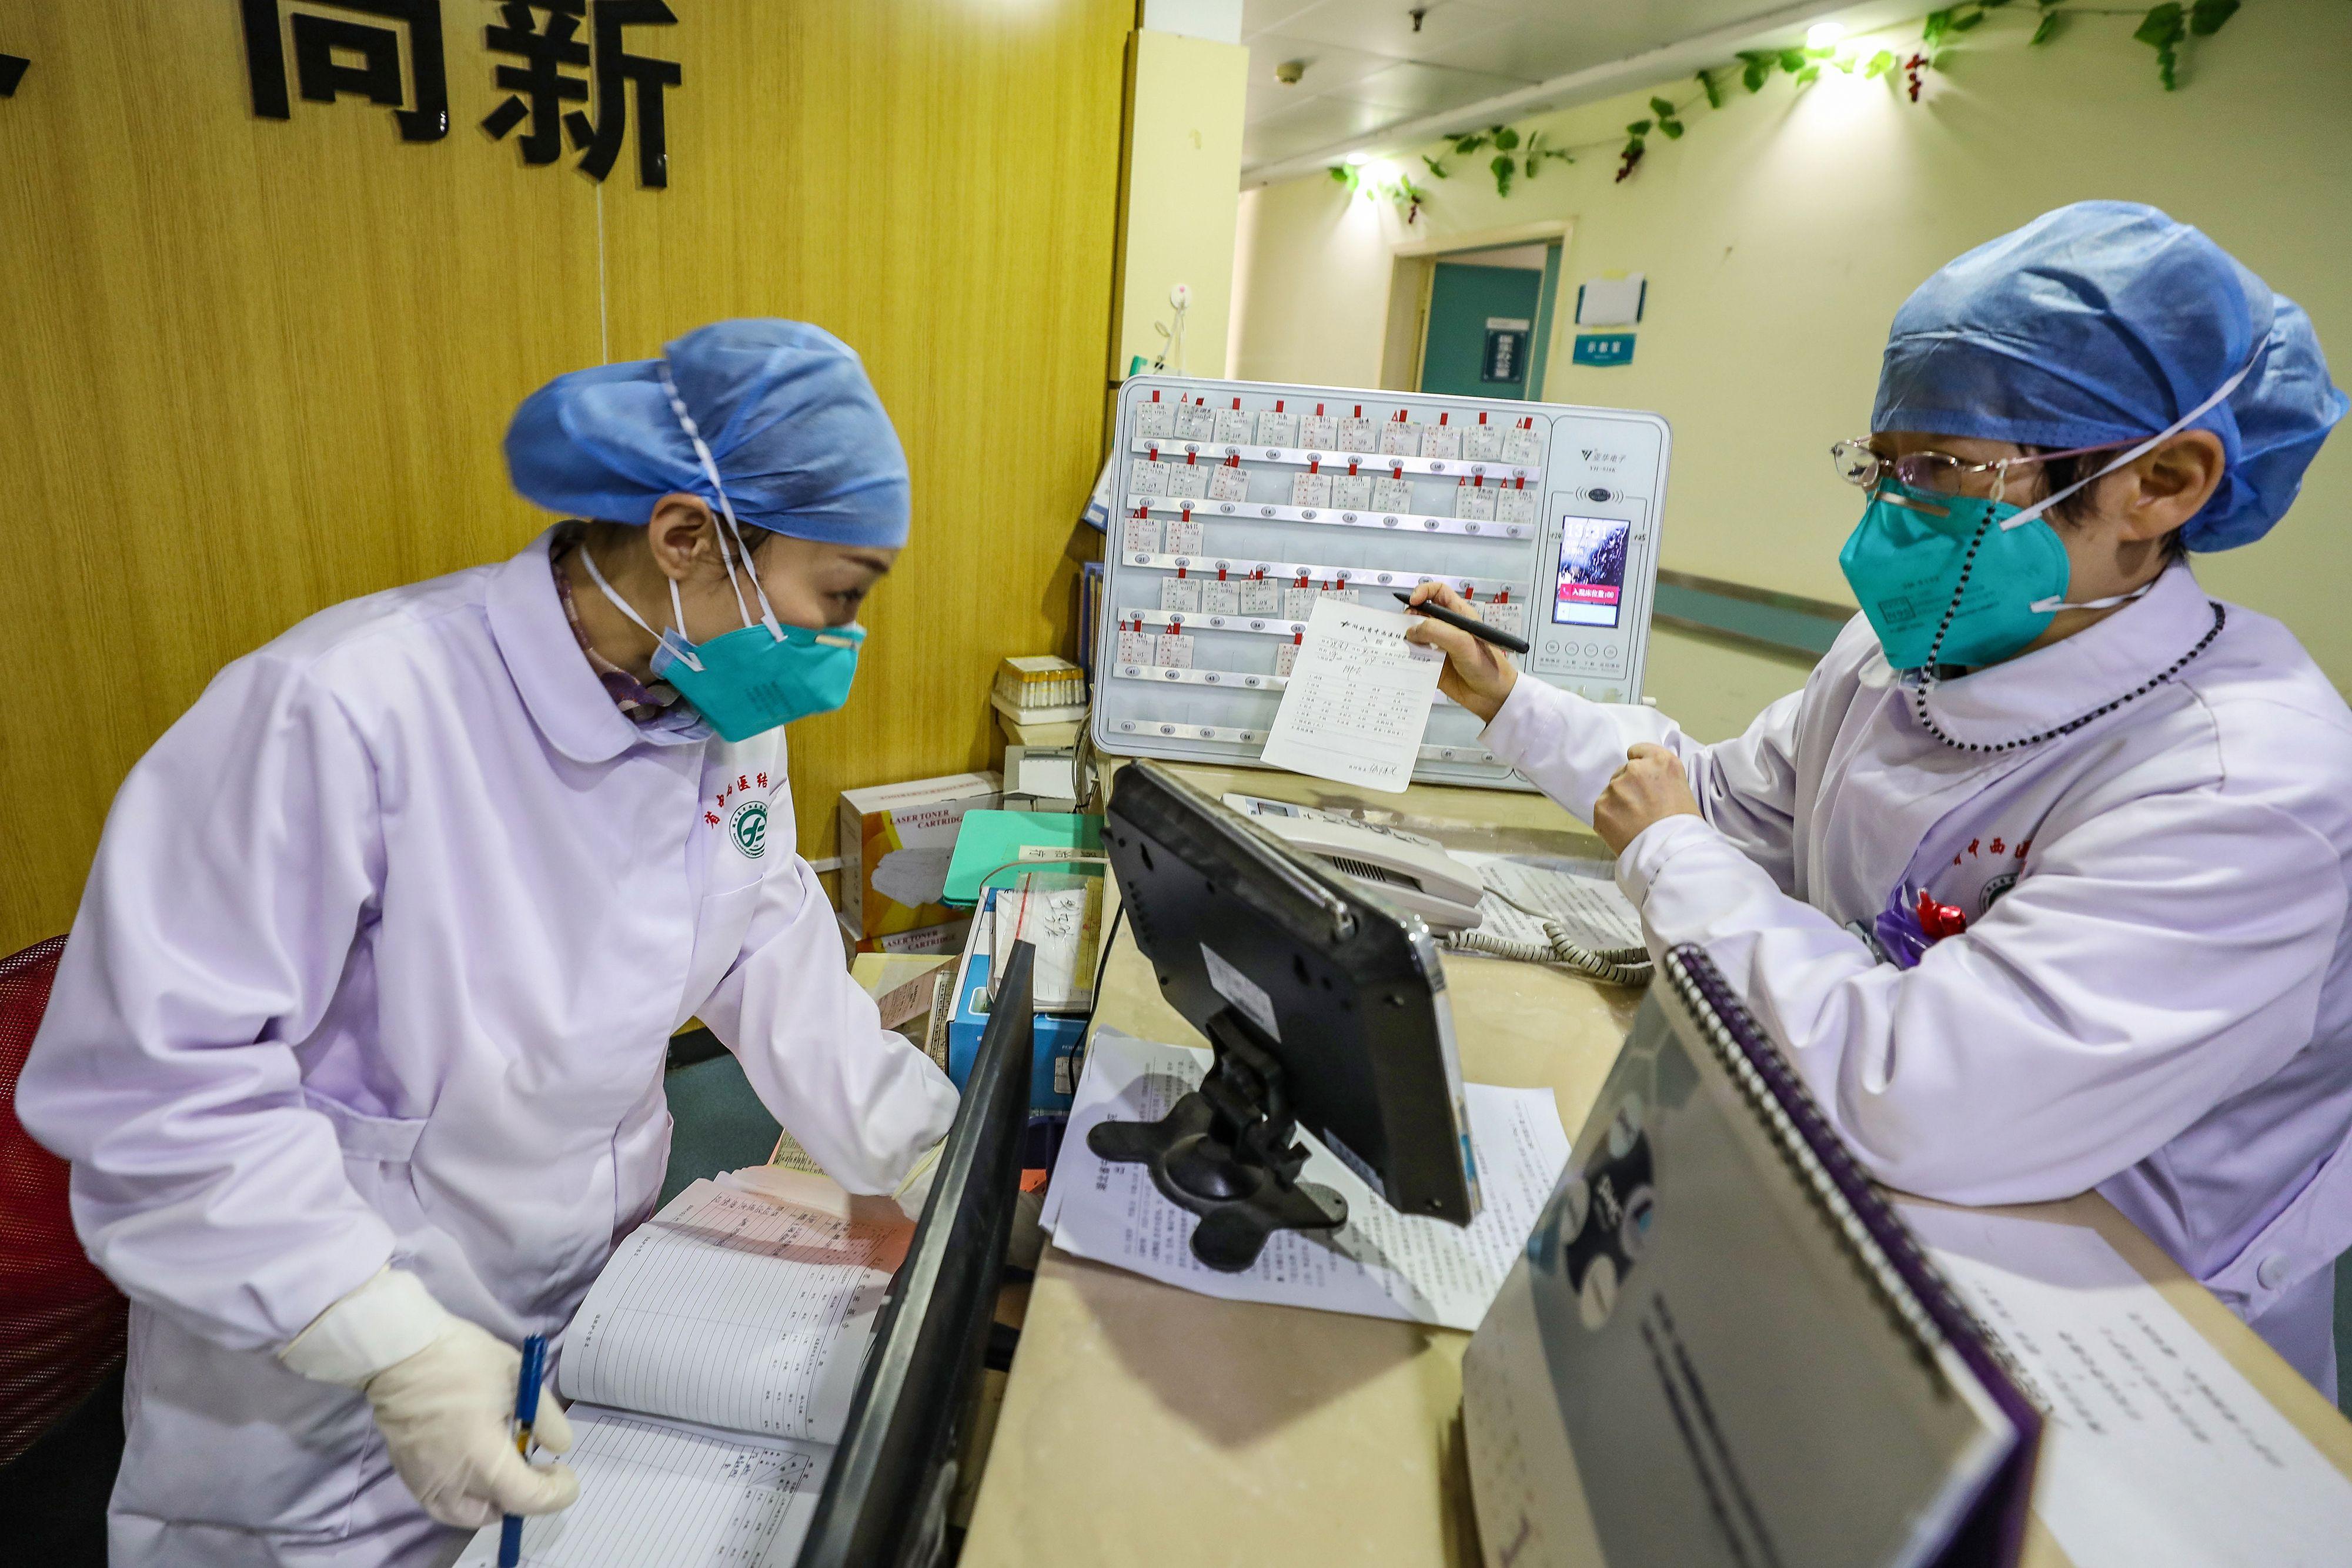 Locals Accuse Chinese Authorities of Misallocating Medical Supply Donations for Coronavirus